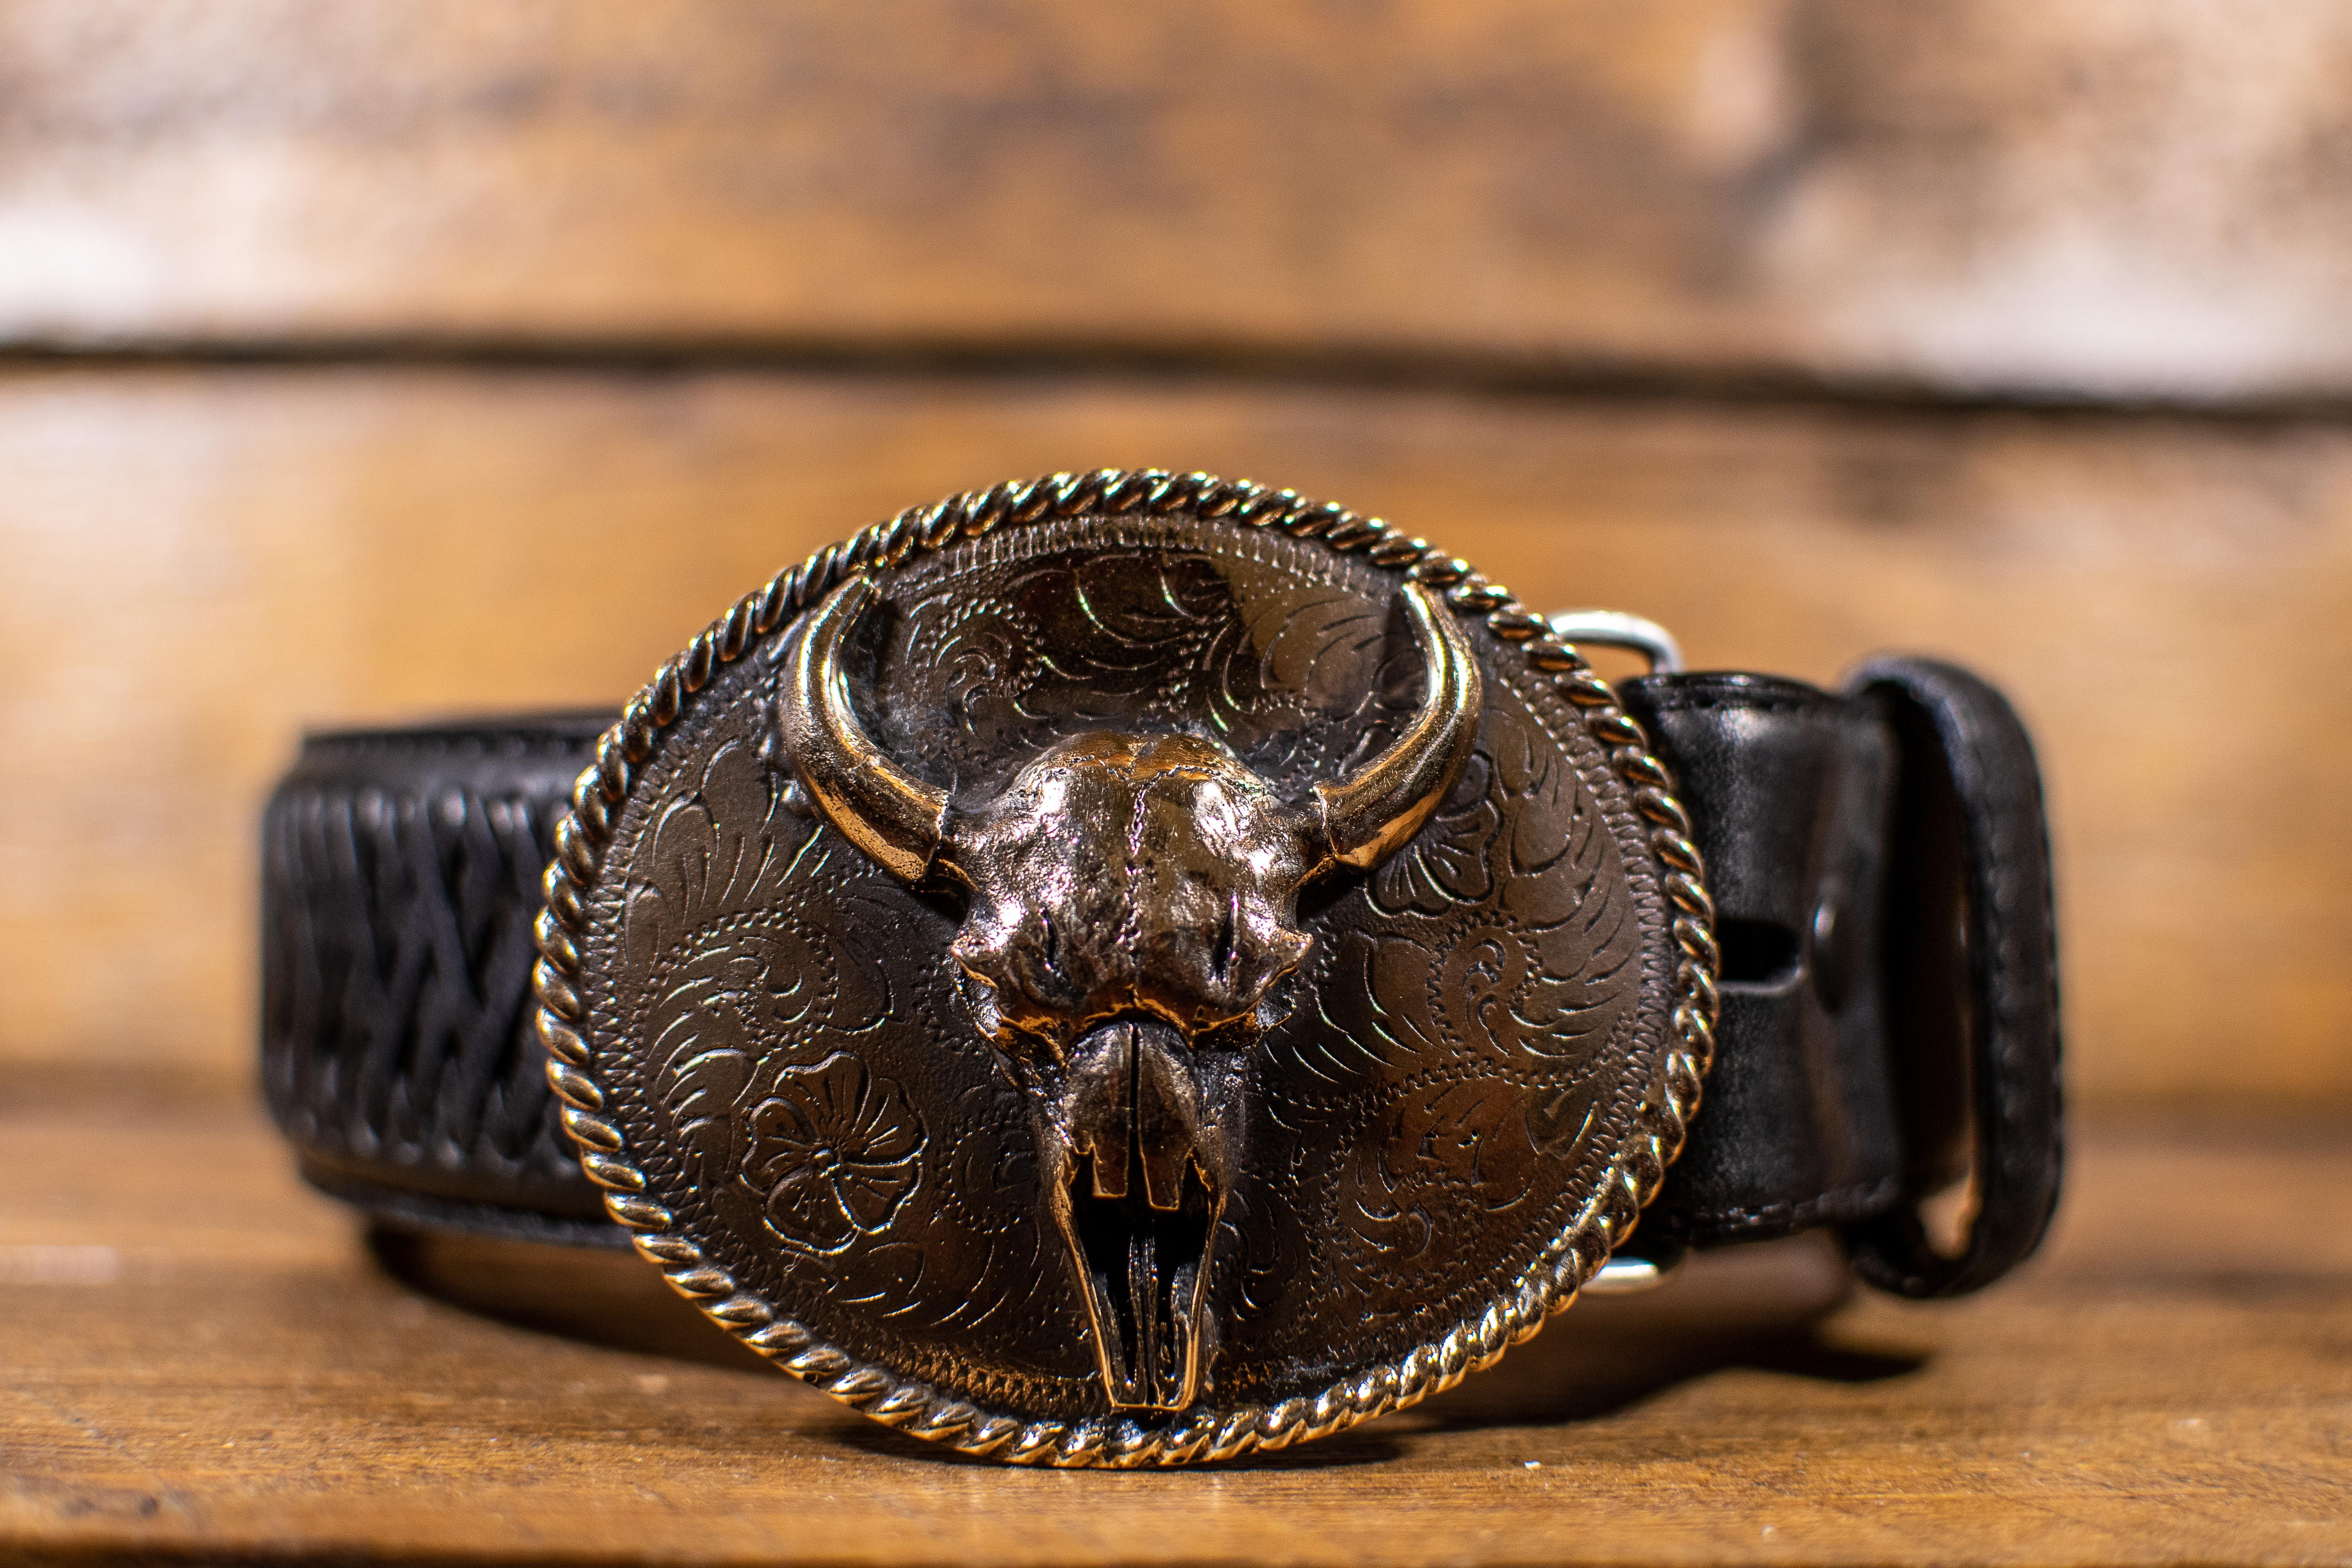 Vintage Bull Skull Buckle